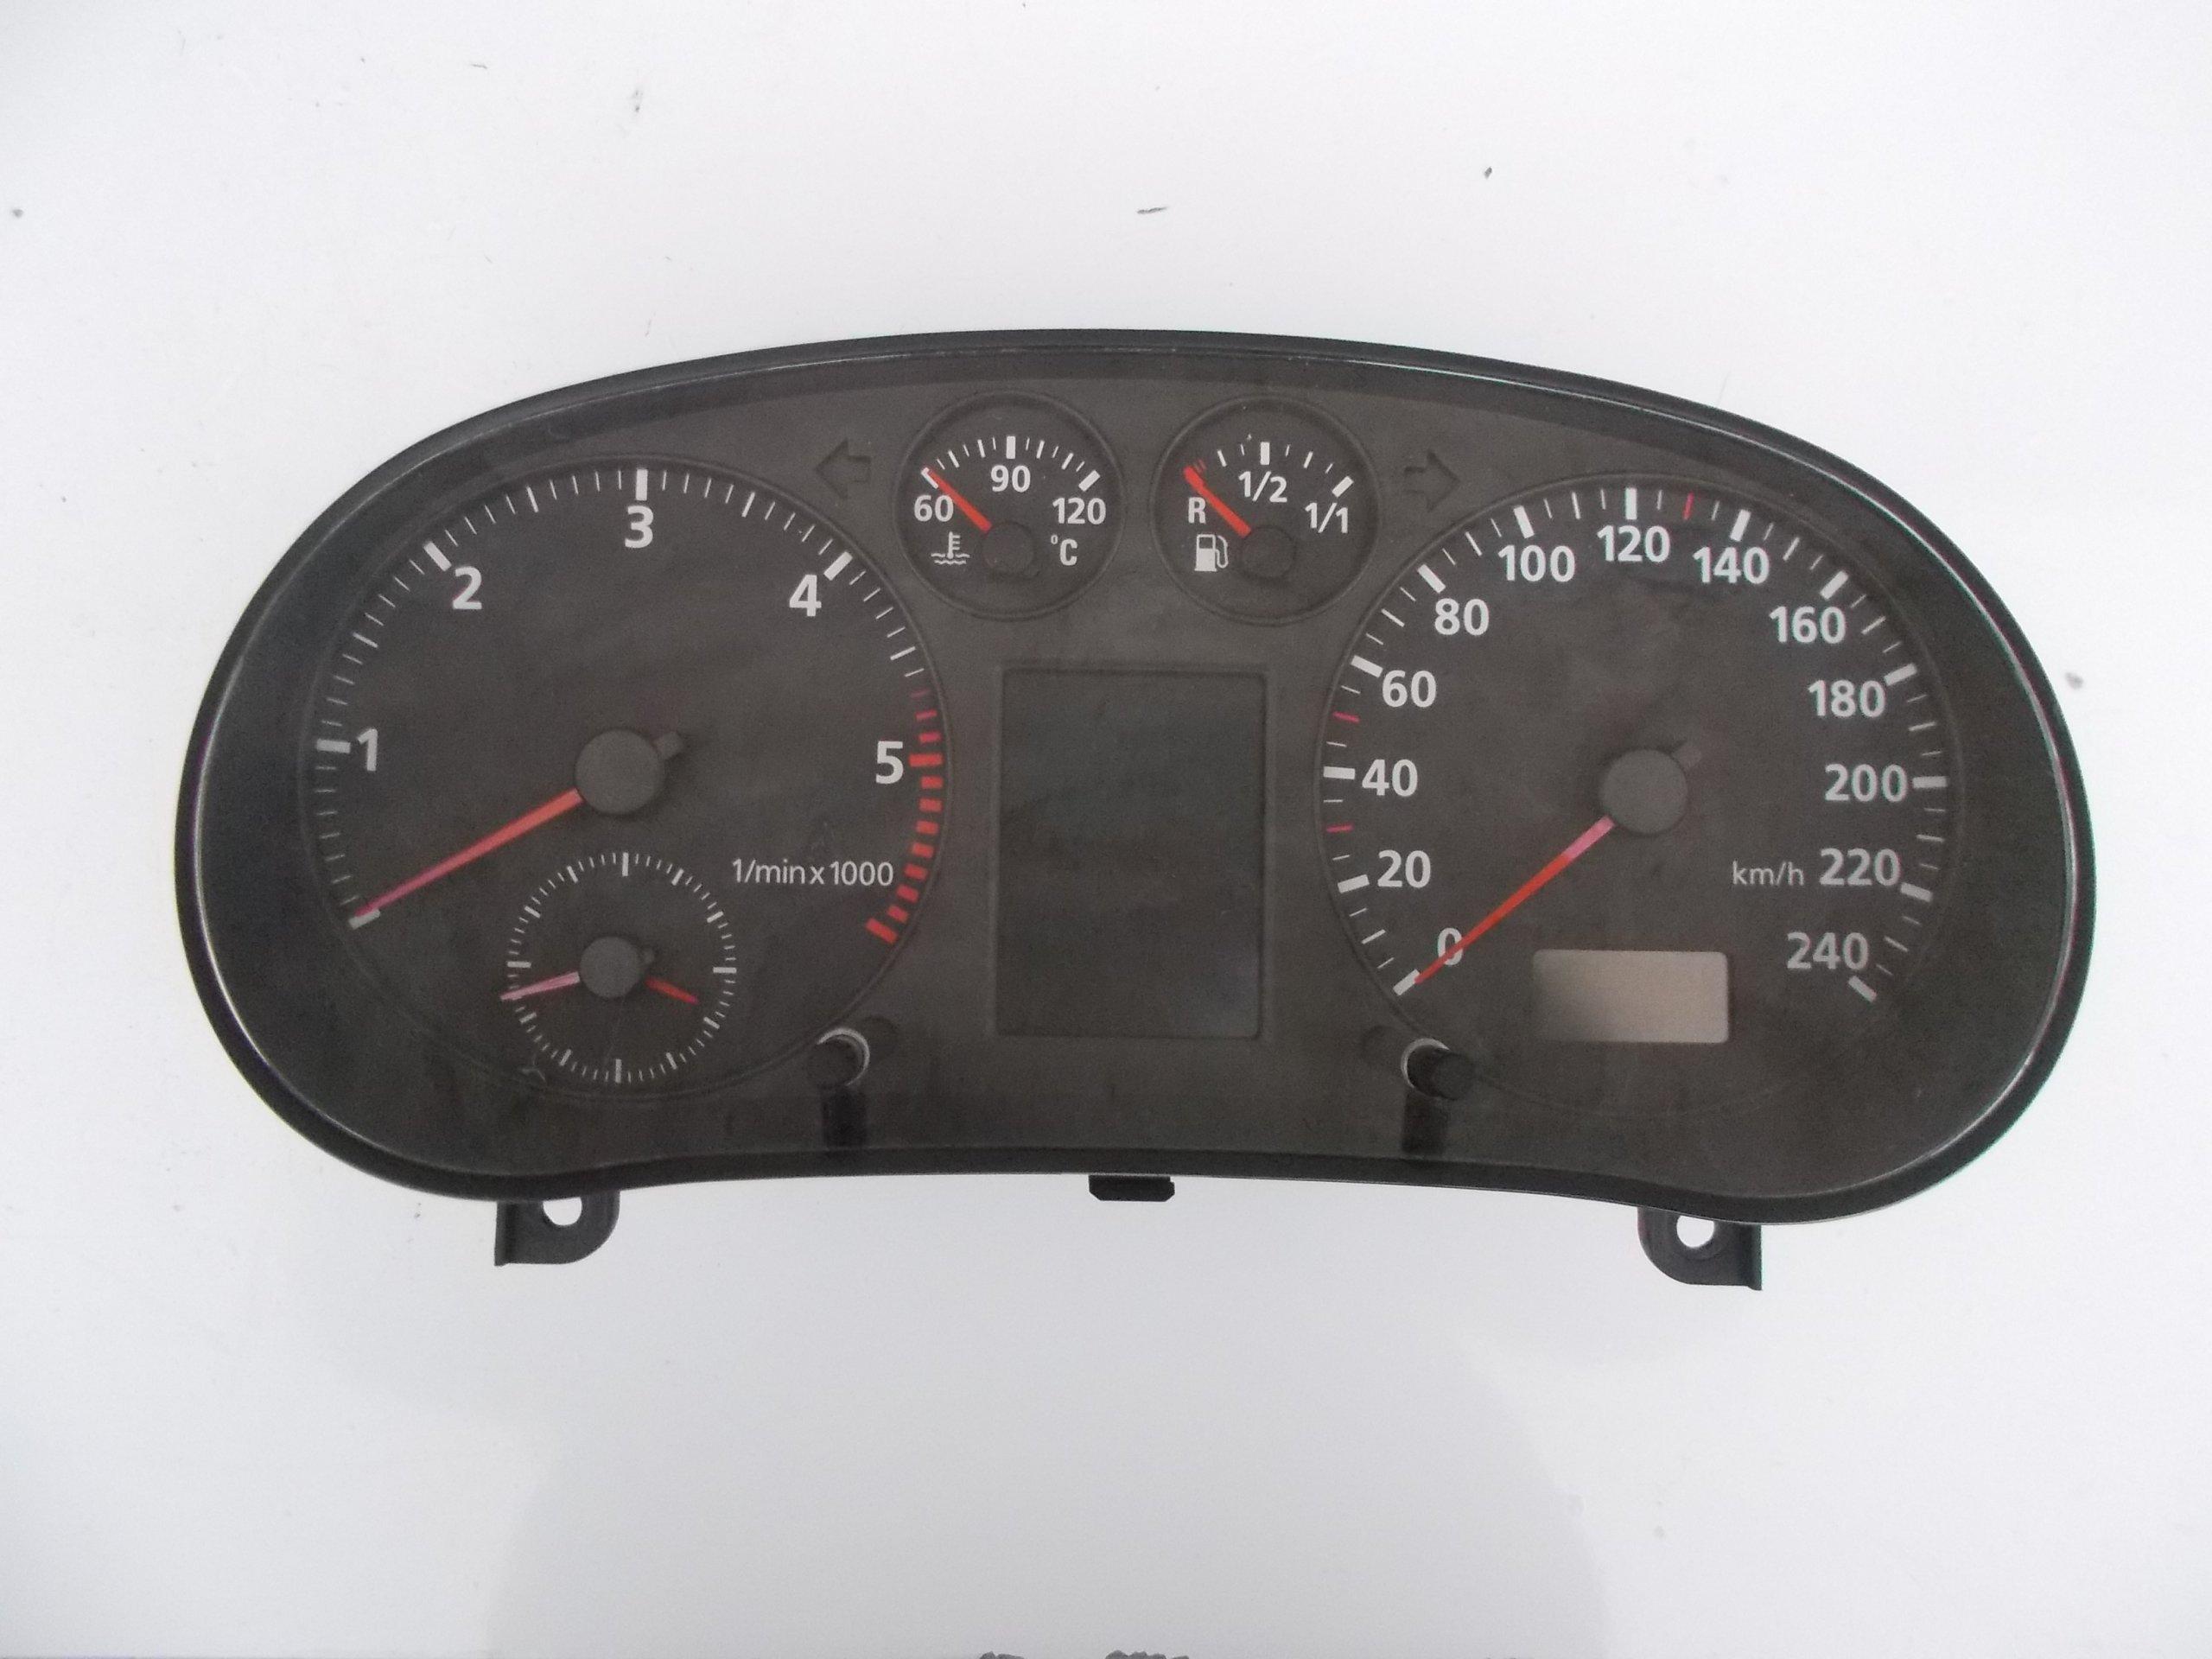 Licznik Zegary Audi A3 8l 19 Tdi 8l0919880 7106777758 Oficjalne